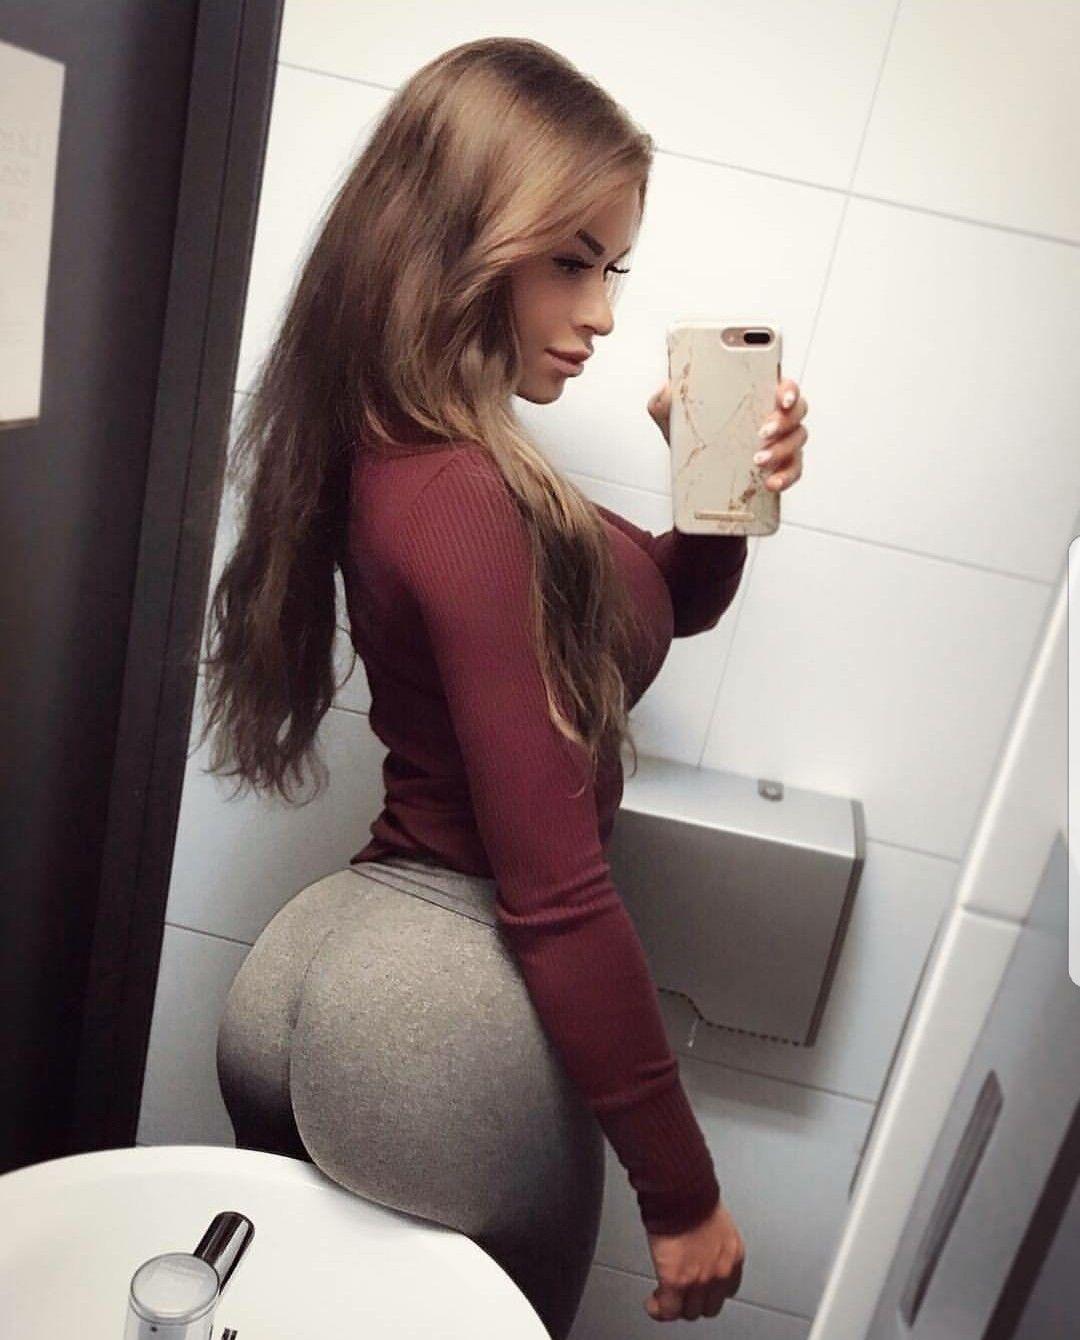 girls showing ass mexican